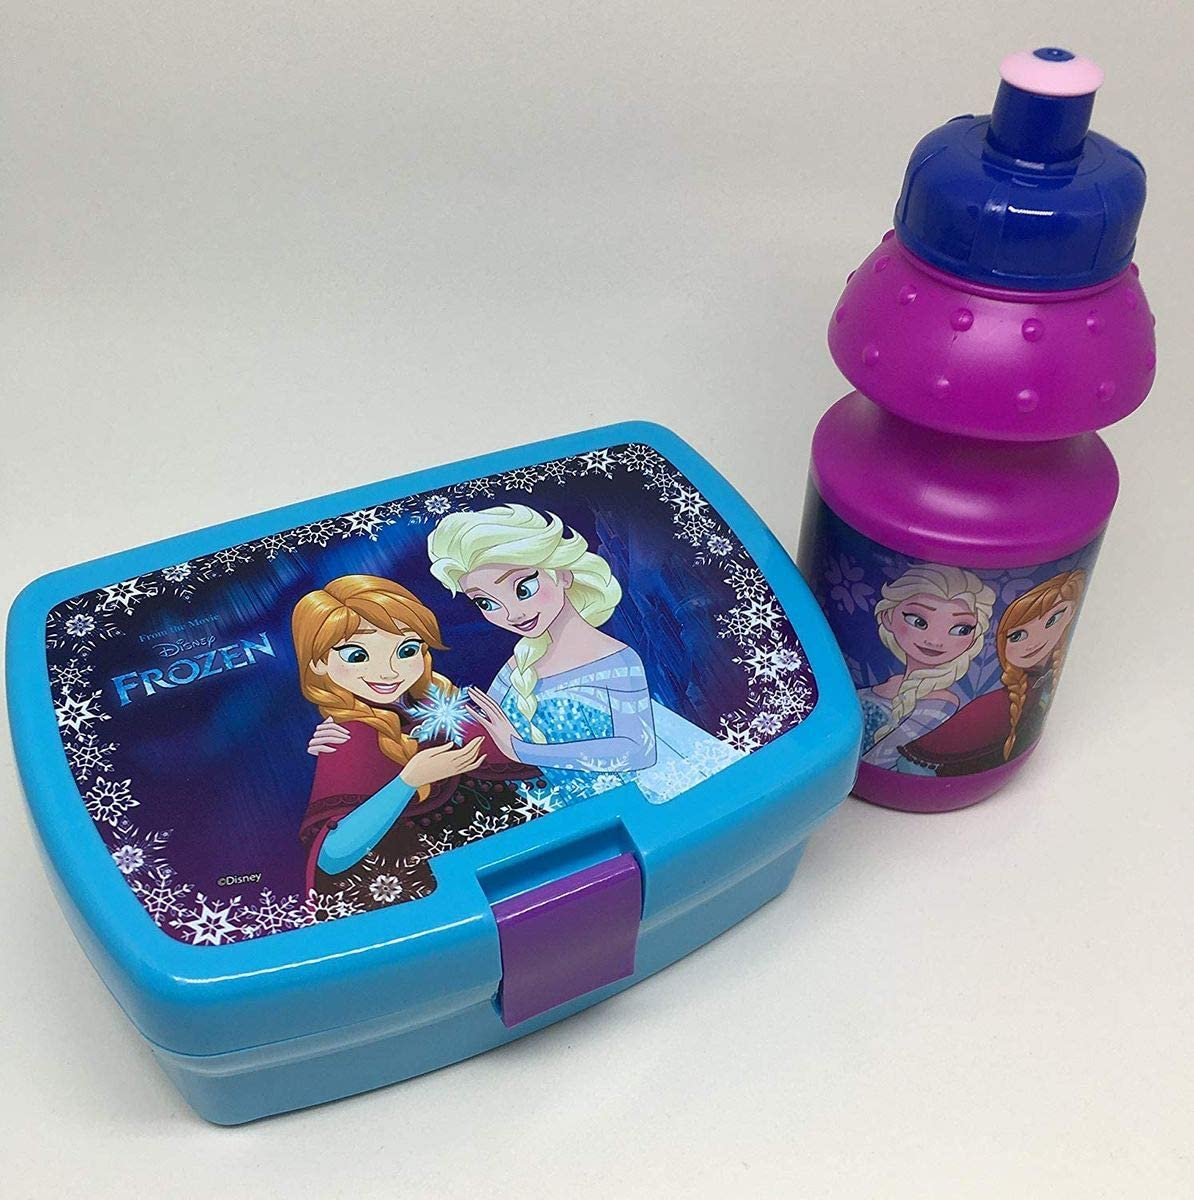 diakakis – 0561610 – Set picnic – Caja de sándwich y botella de ...